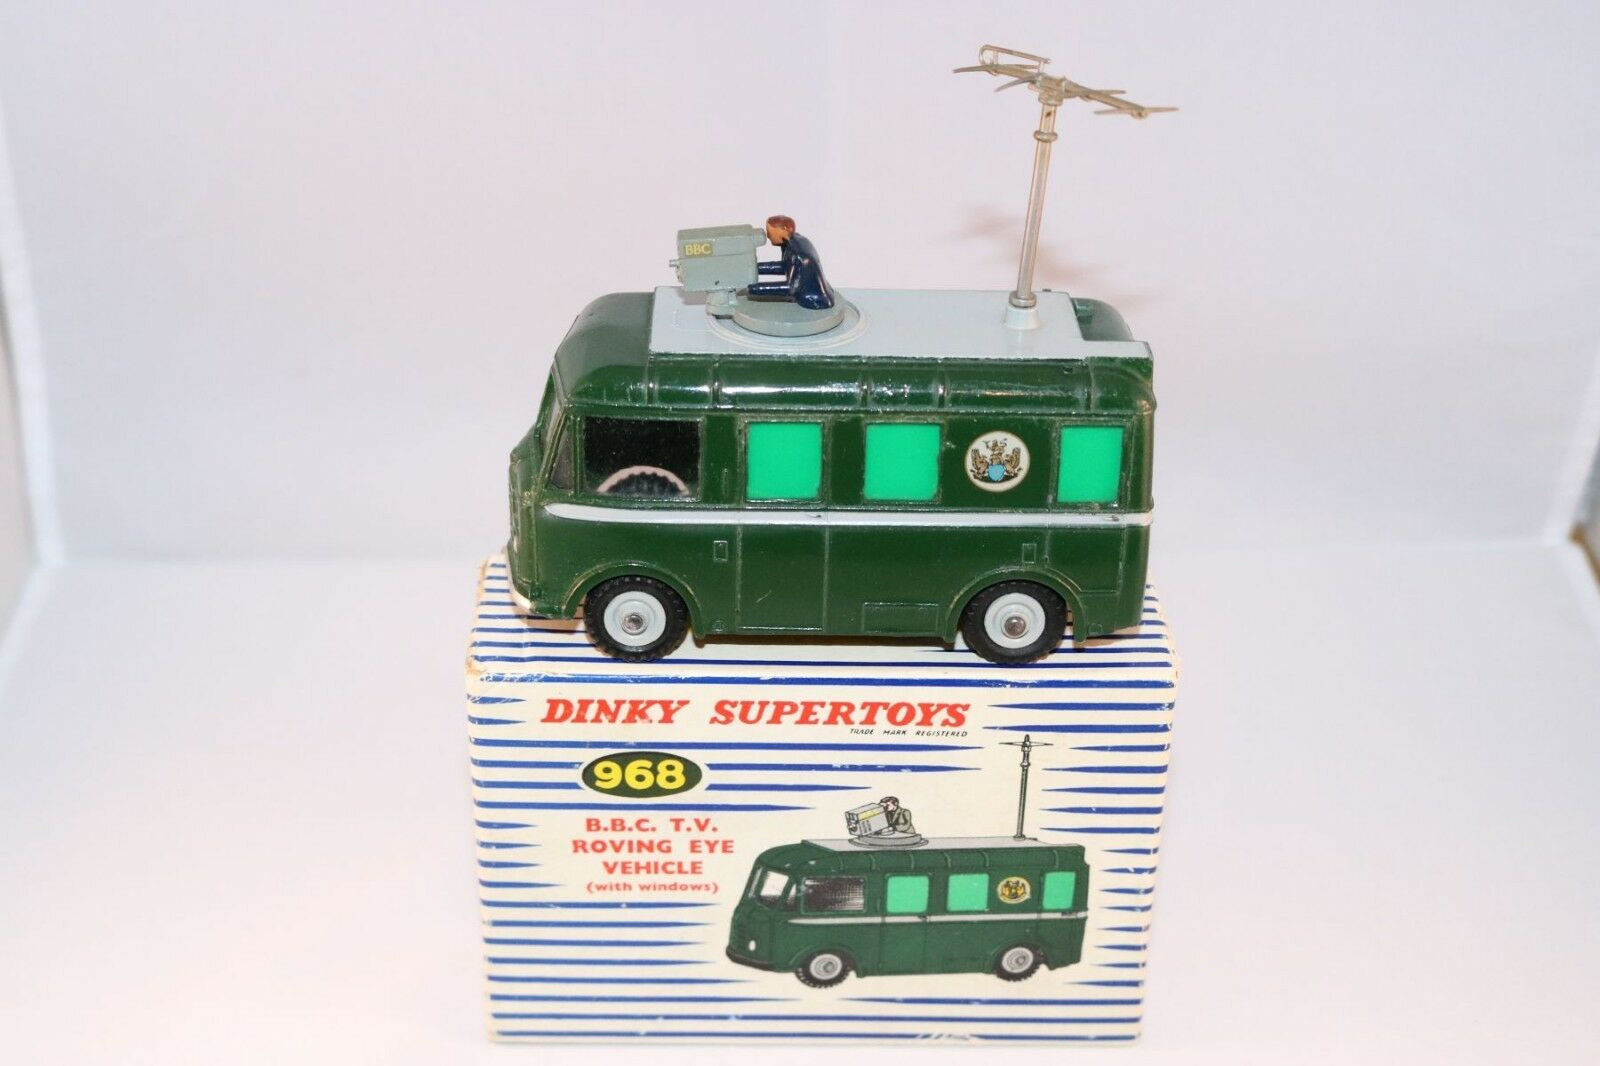 Dinky Toys 968 B.B.C. Roving Eye Vehicle very near mint in box all original